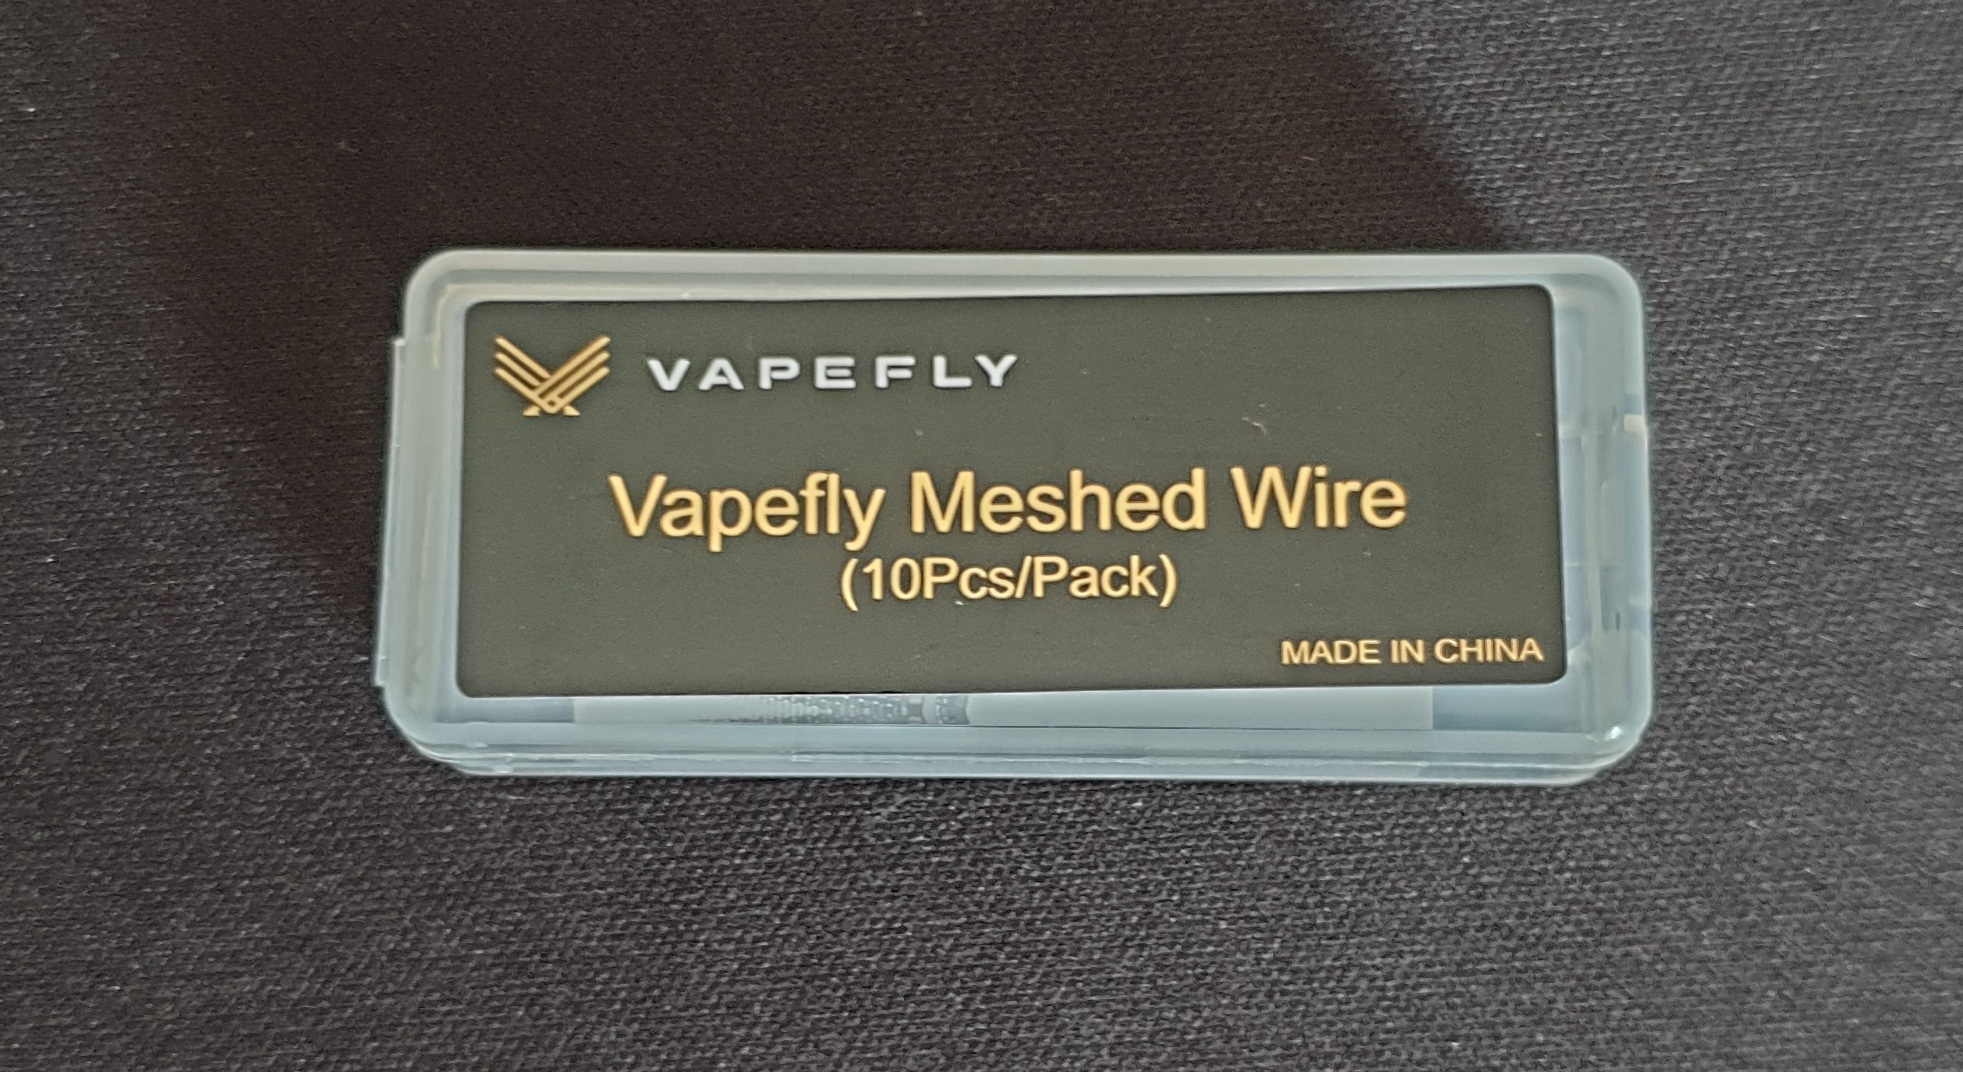 10 x 10 St. Vapefly Siegfried RTA KA1 Grid Mesh Wire - M4 = 100 Coils